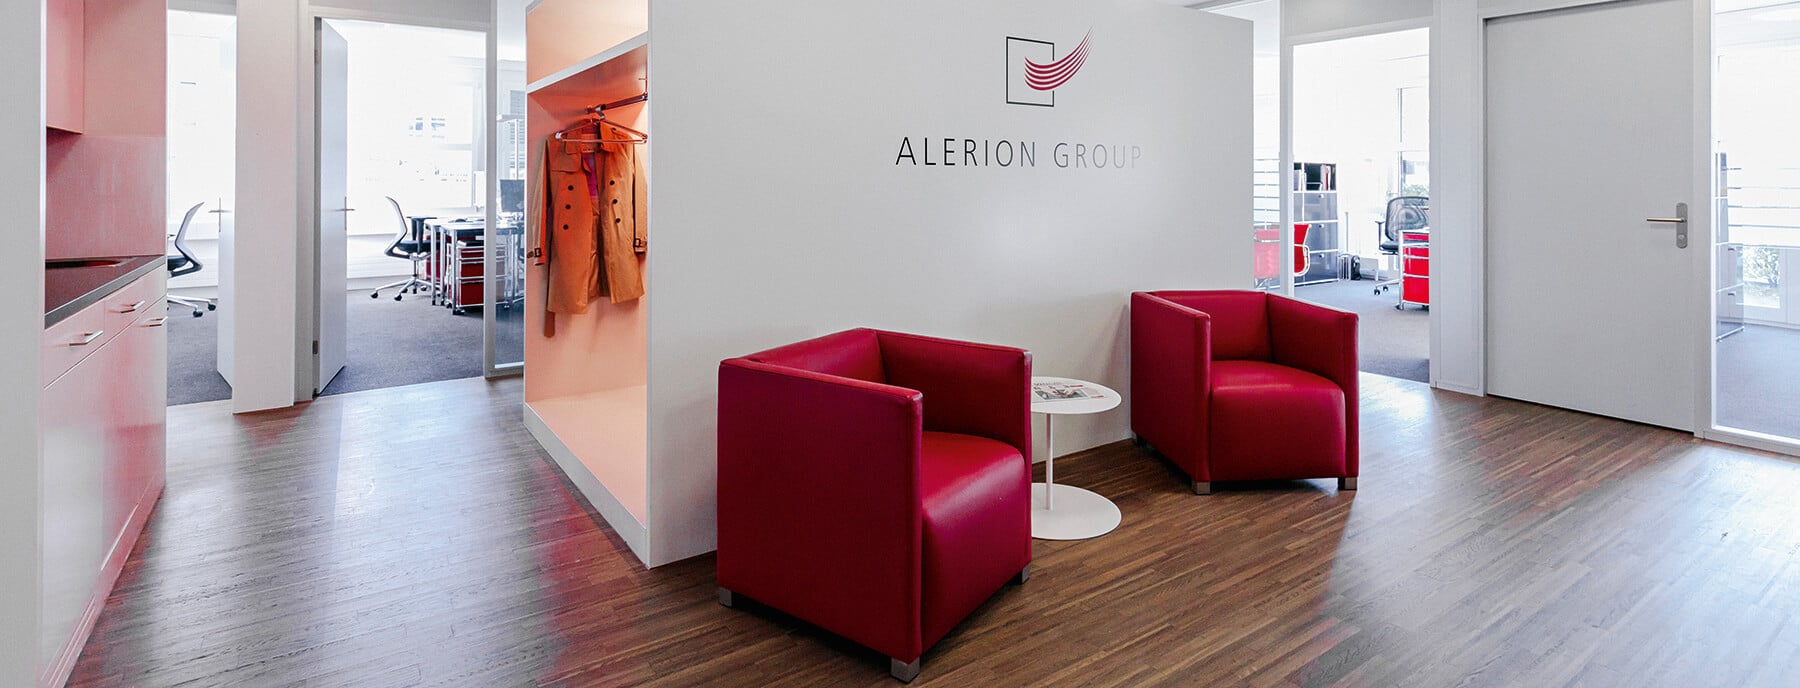 Alerion Strategieberatung Hauptsitz